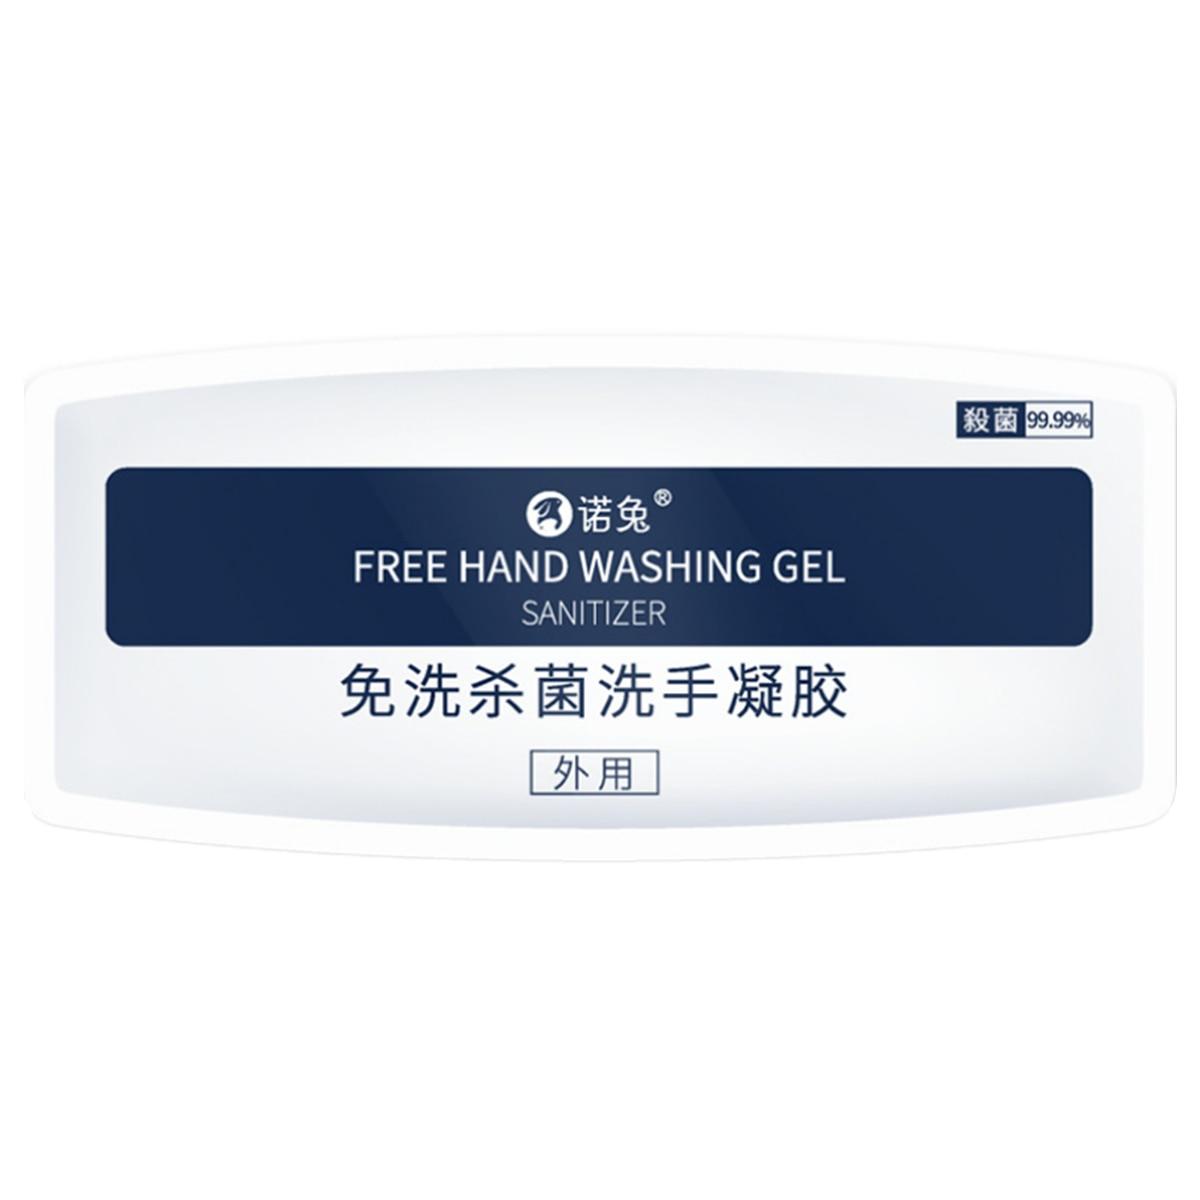 60Pcs 3ml EG Mini Travel Portable Disinfection Hand Sanitizer Gel No Alcohol Outdoor Disposable No Clean Waterless Handgel